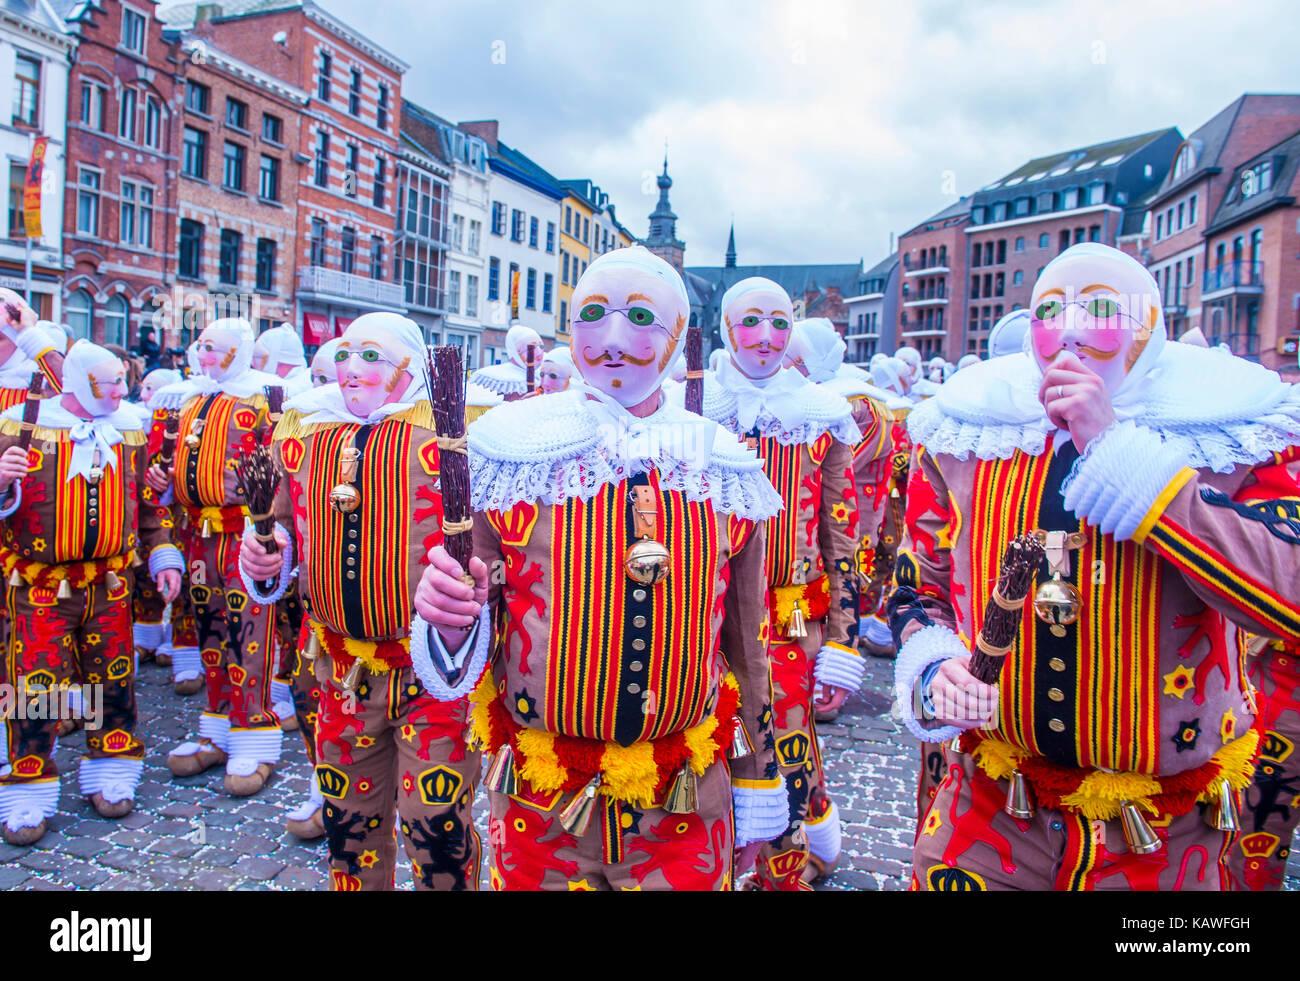 Participants in the Binche Carnival in Binche, Belgium Stock Photo